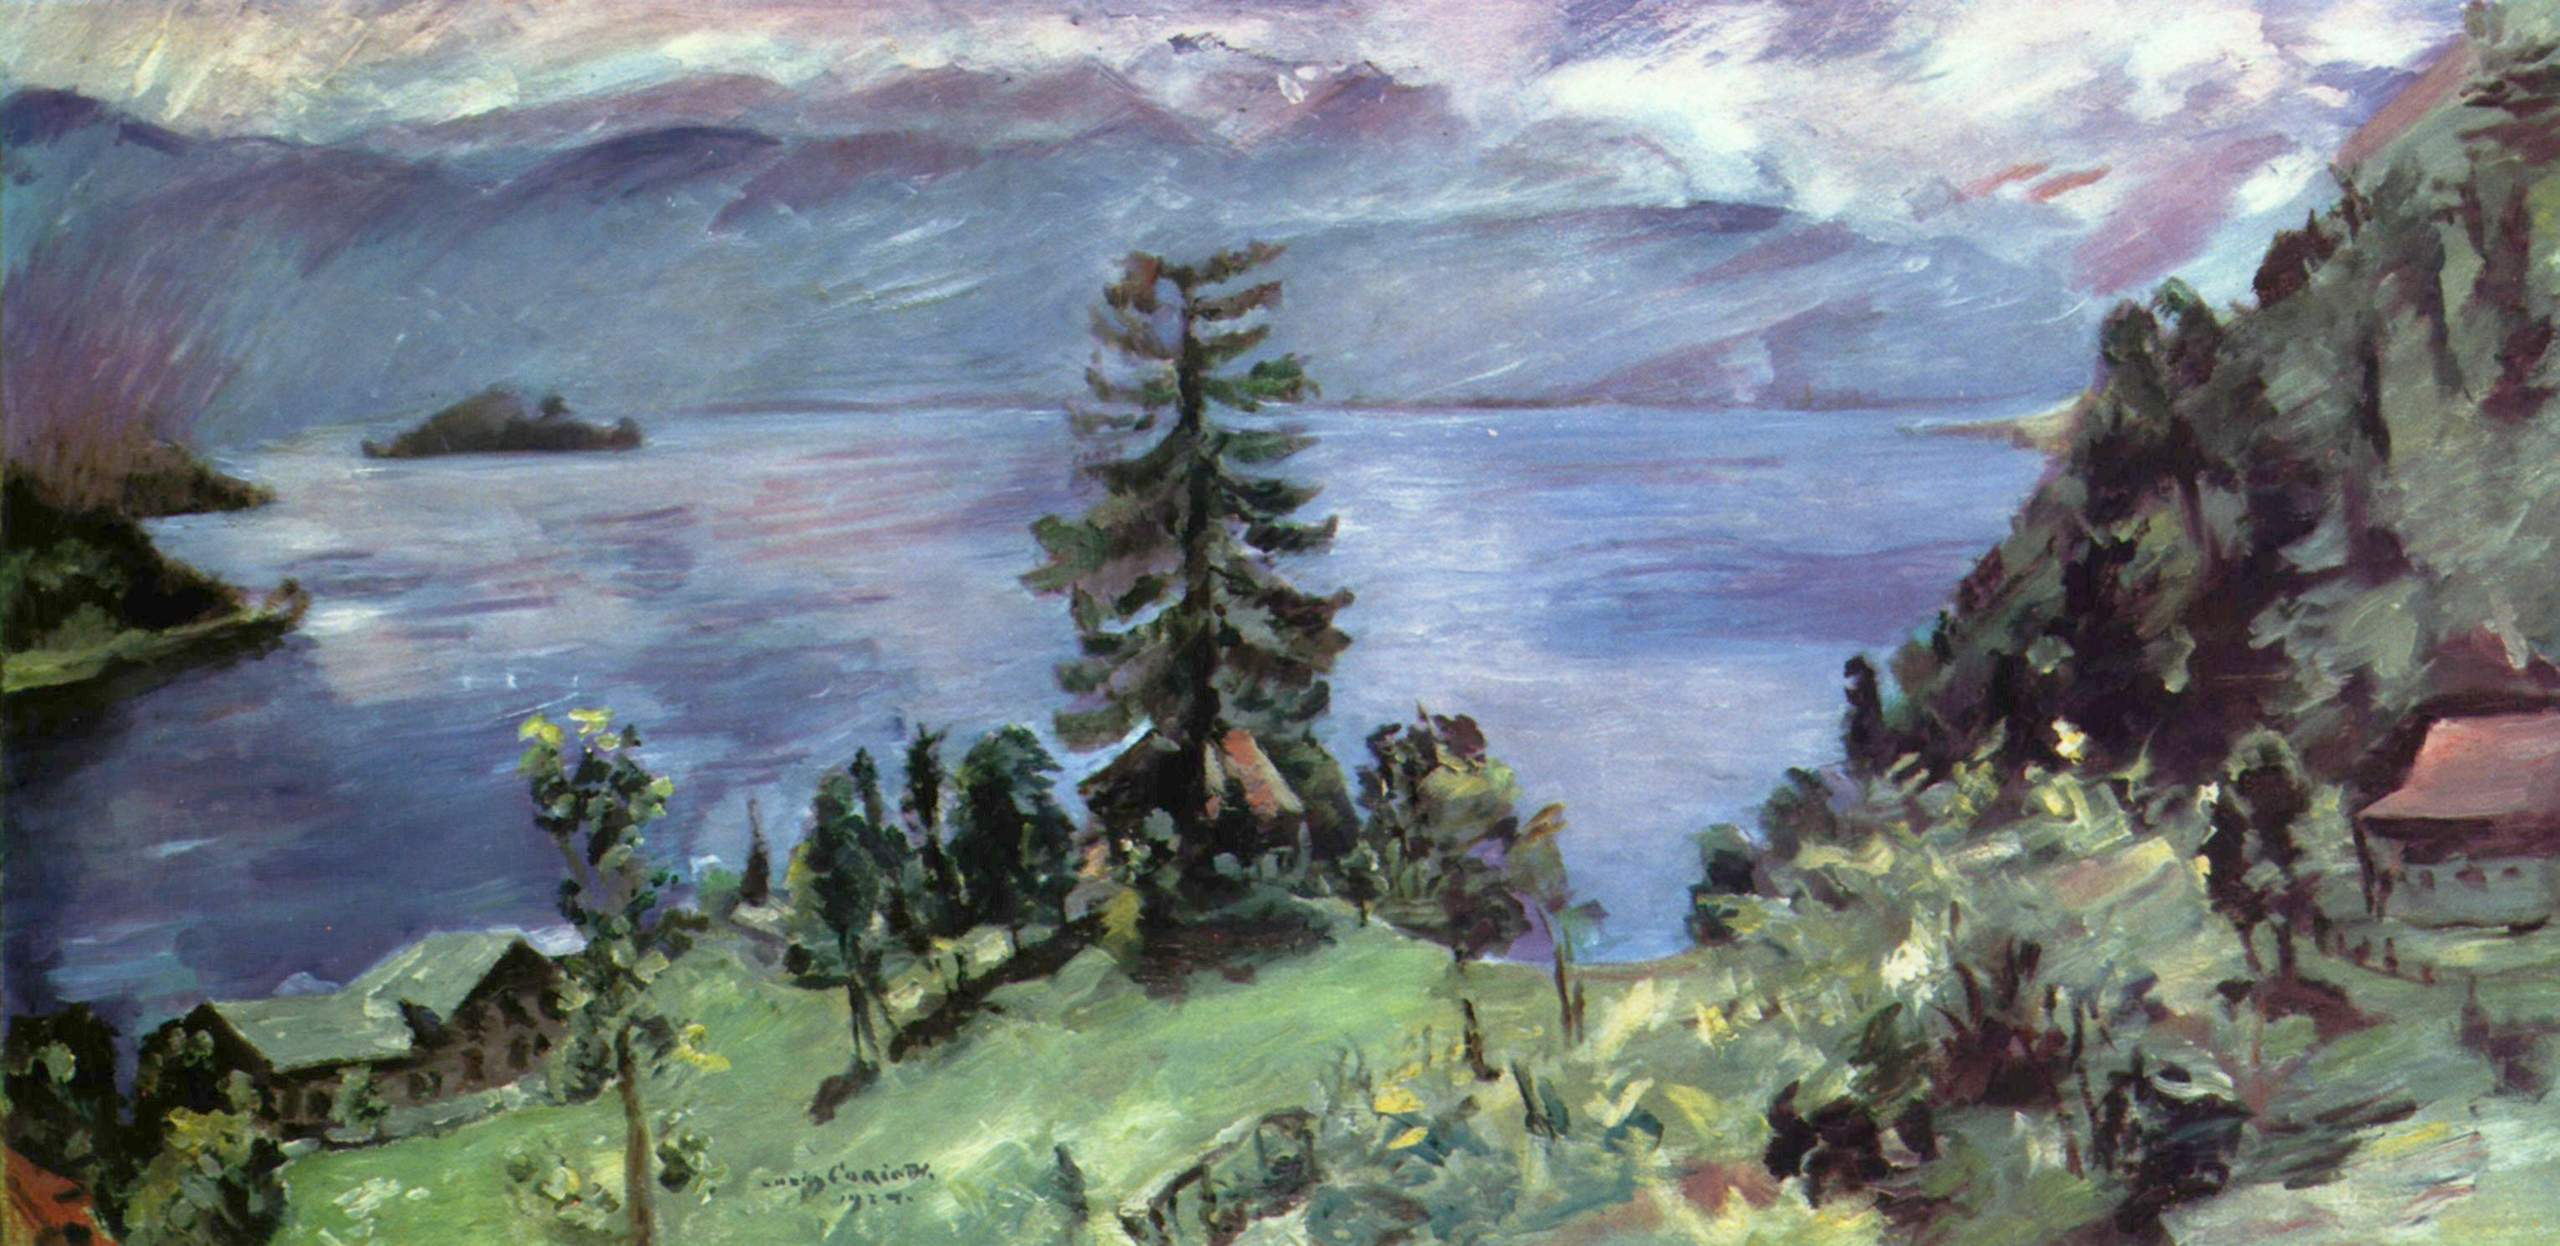 Панорама озера Вальхен, вид из церкви, Коринт Ловис